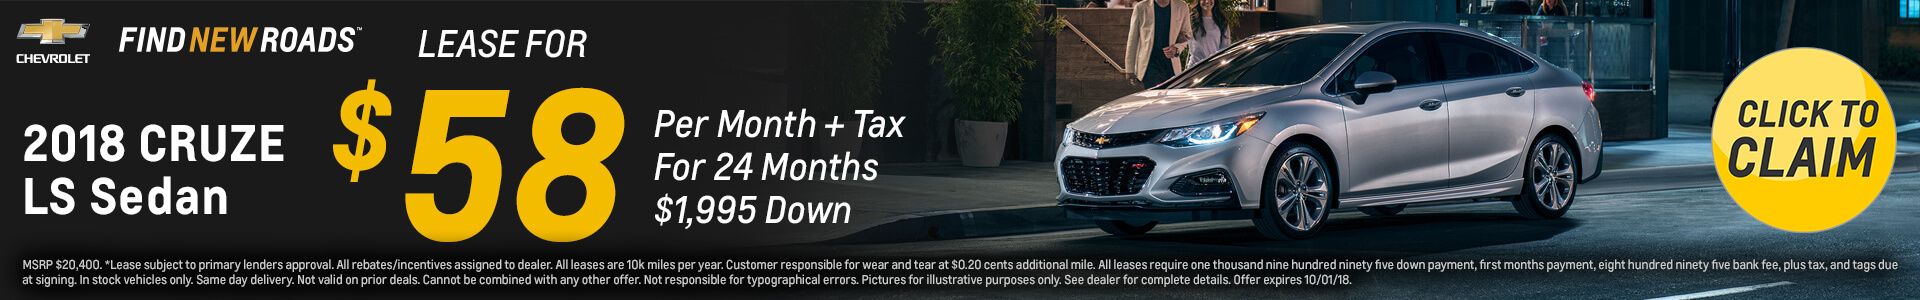 Chevrolet Cruze $58 Lease